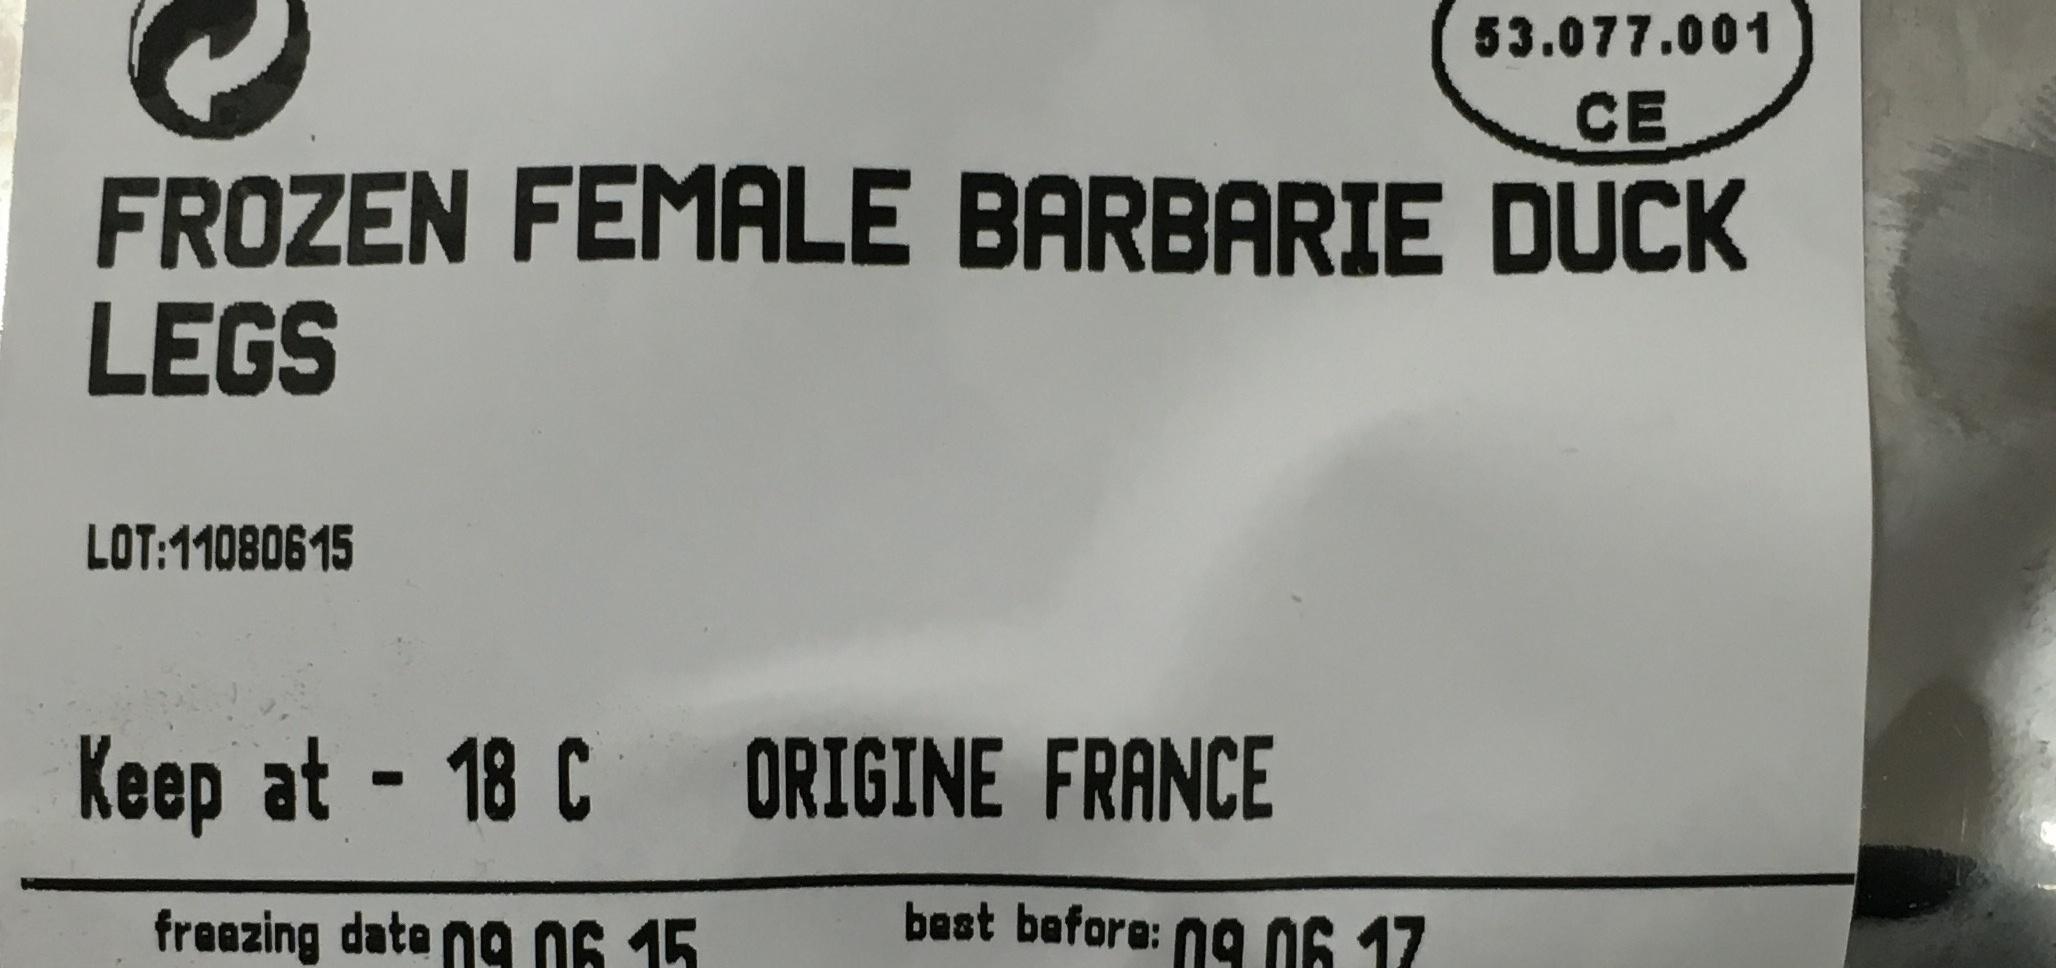 Canard de Barbarie - Ingrédients - fr